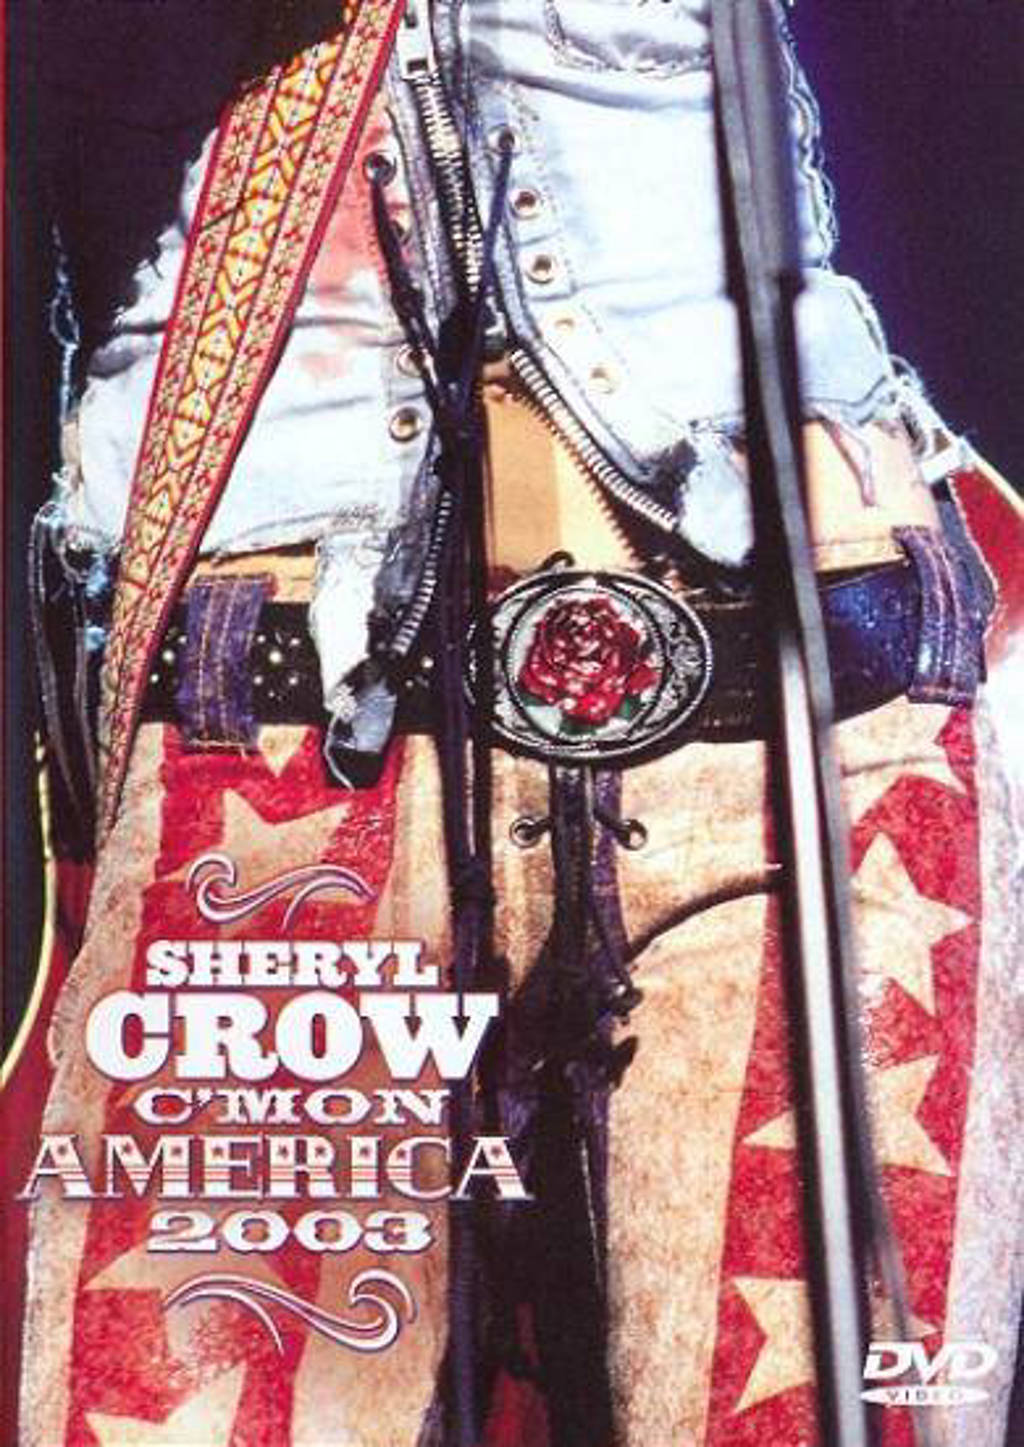 Sheryl Crow - C'mon America 2003 (DVD)